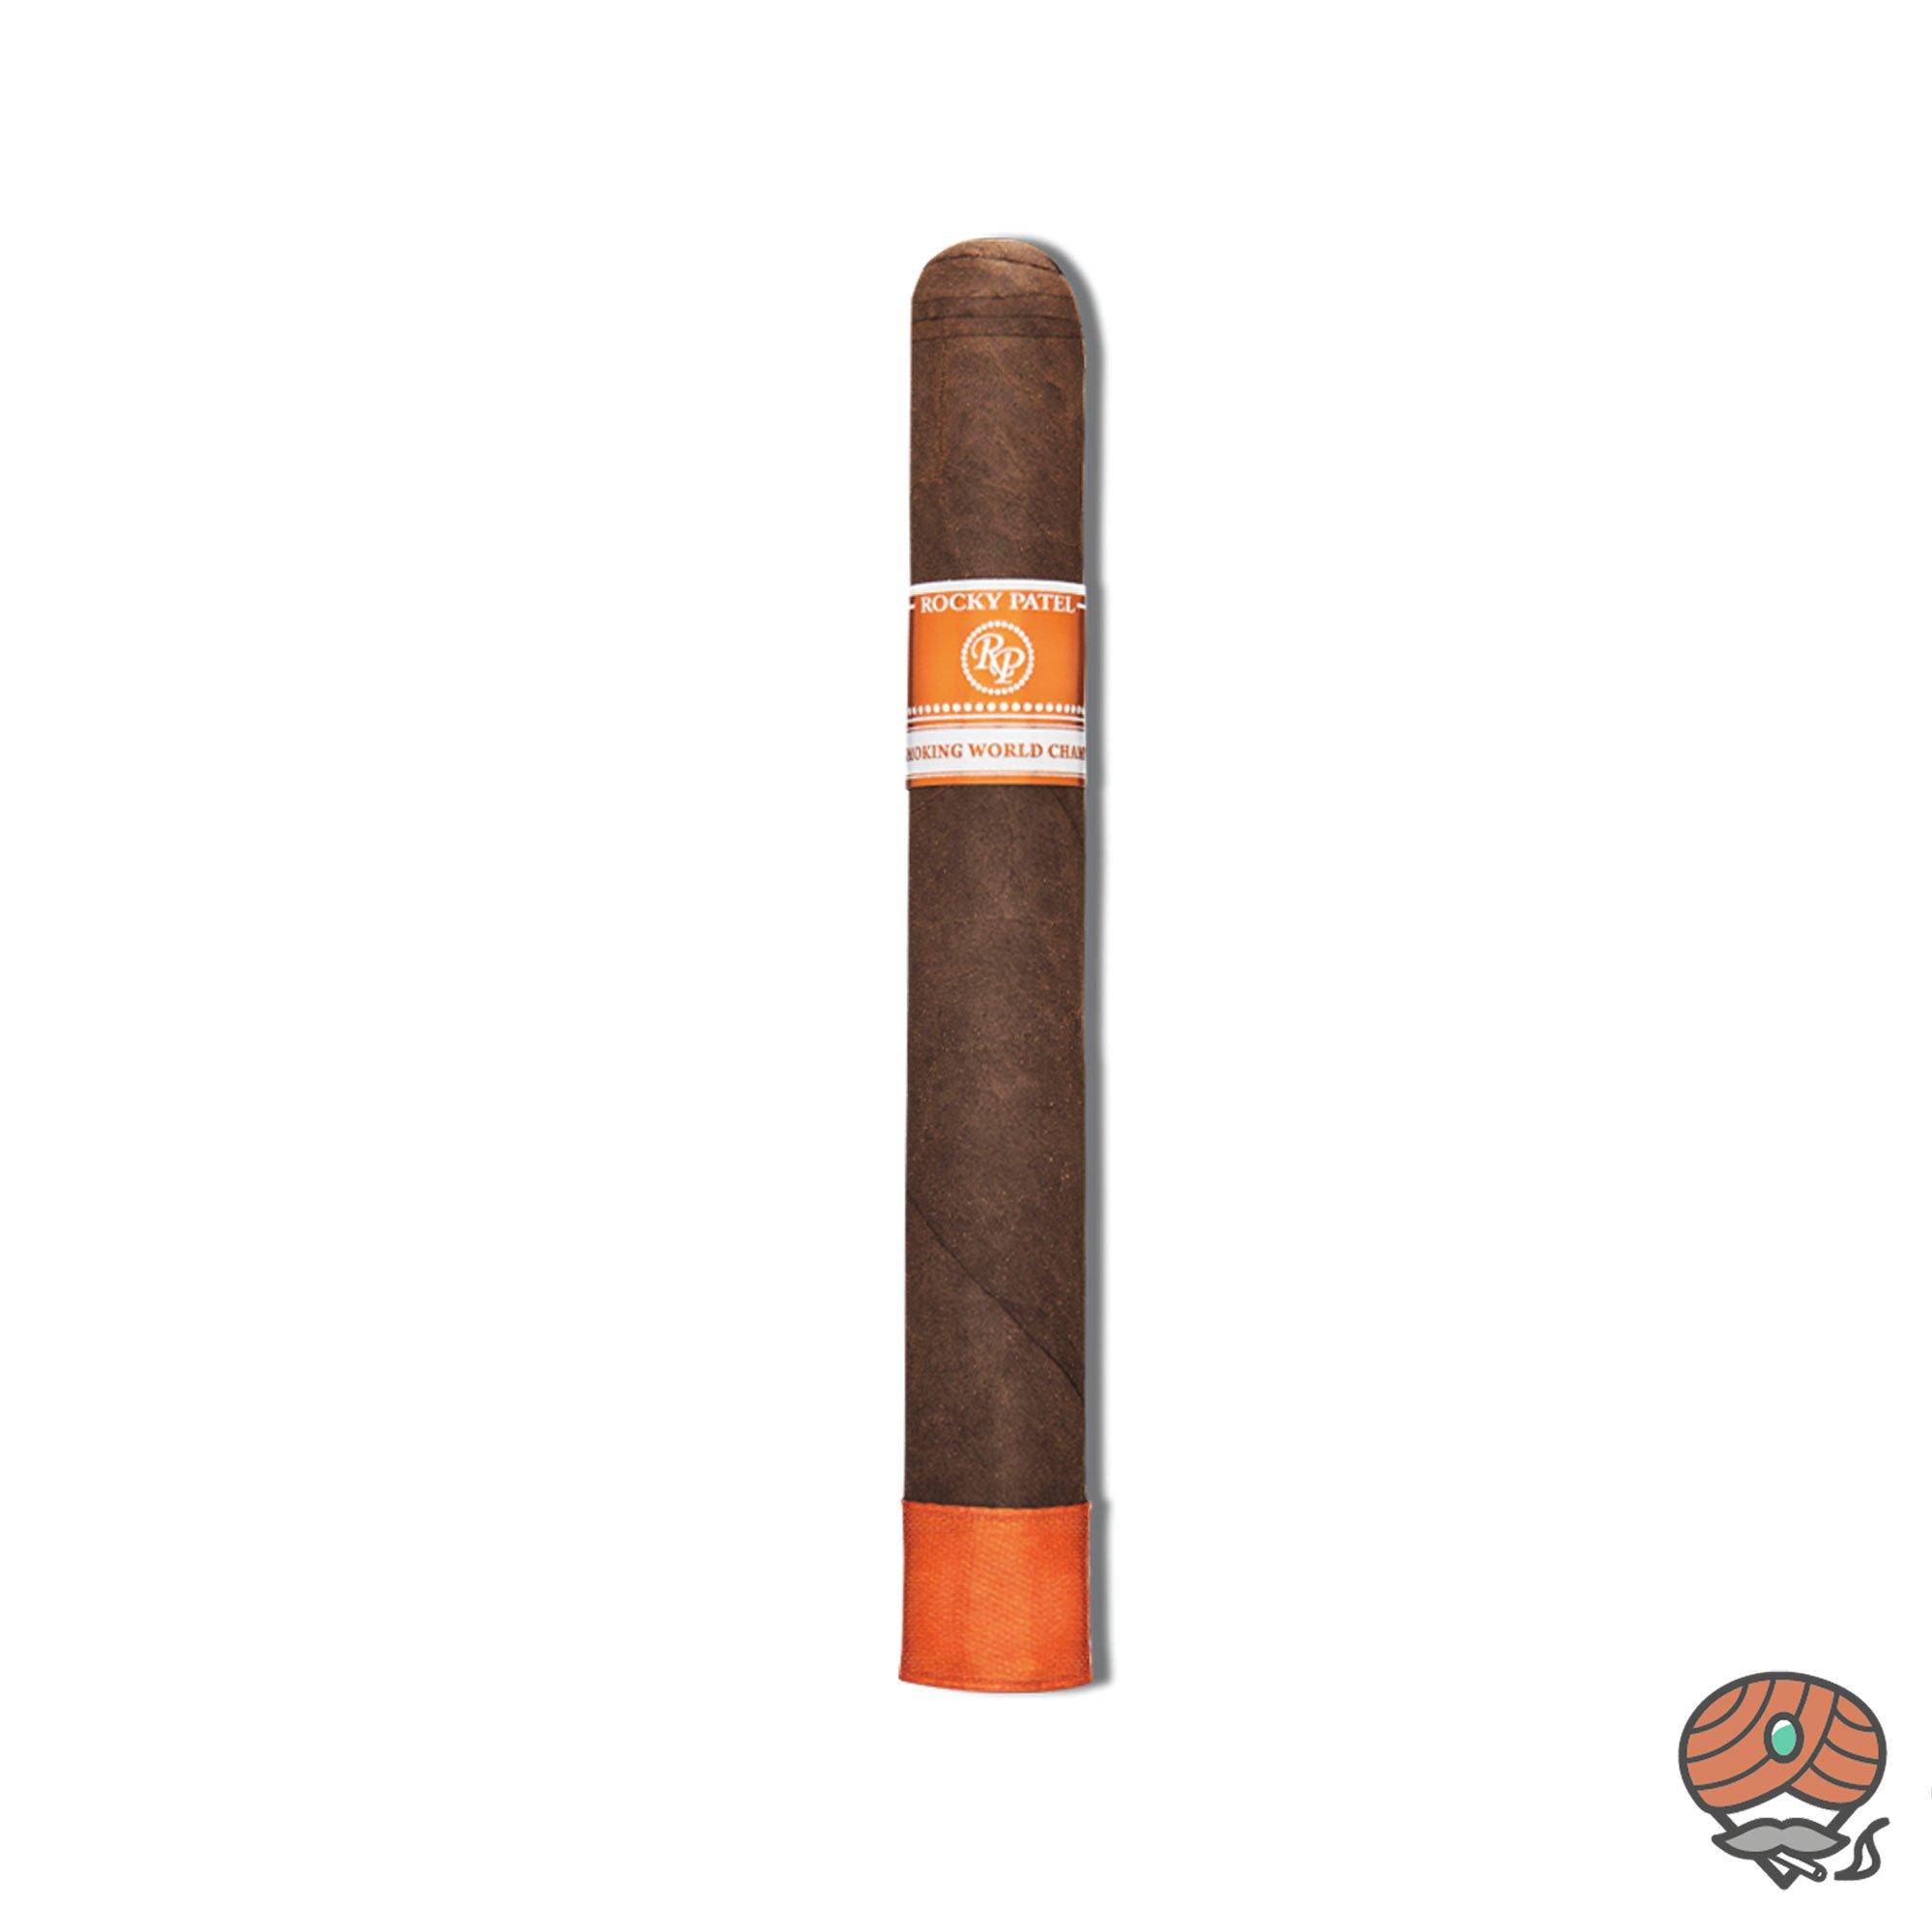 Rocky Patel (RP) CSWC Toro Zigarre Nicaragua